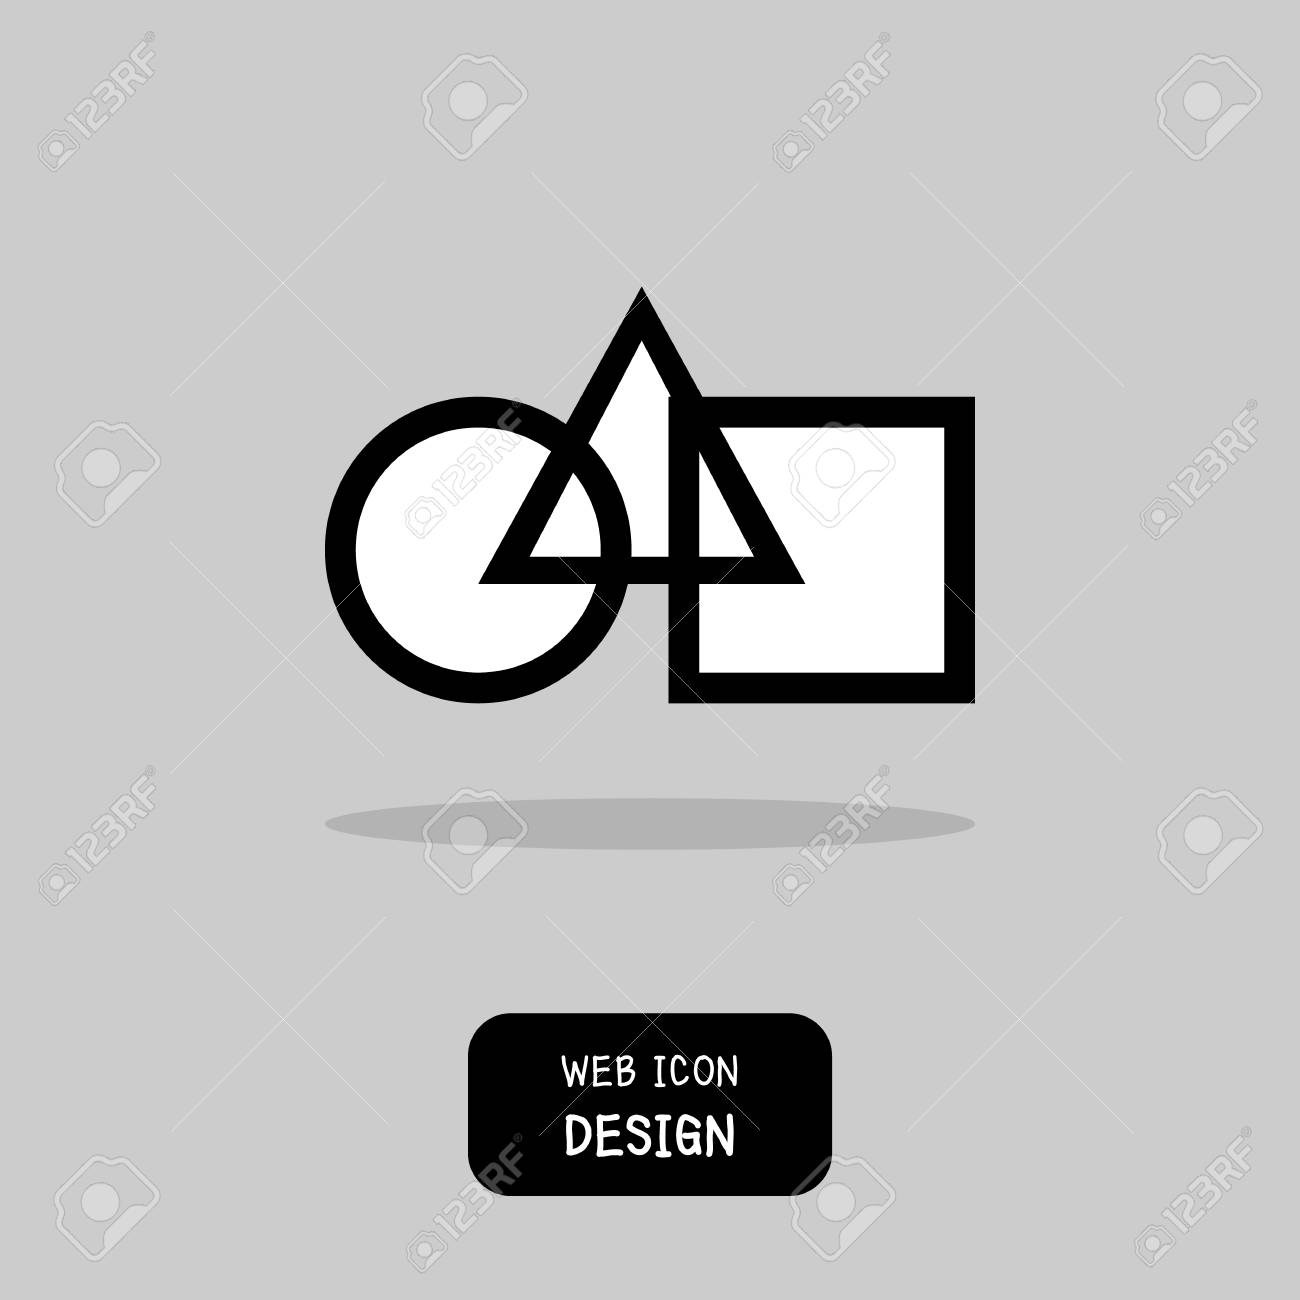 Vector Interlocked Circle Triangle And Square Geometric Symbols